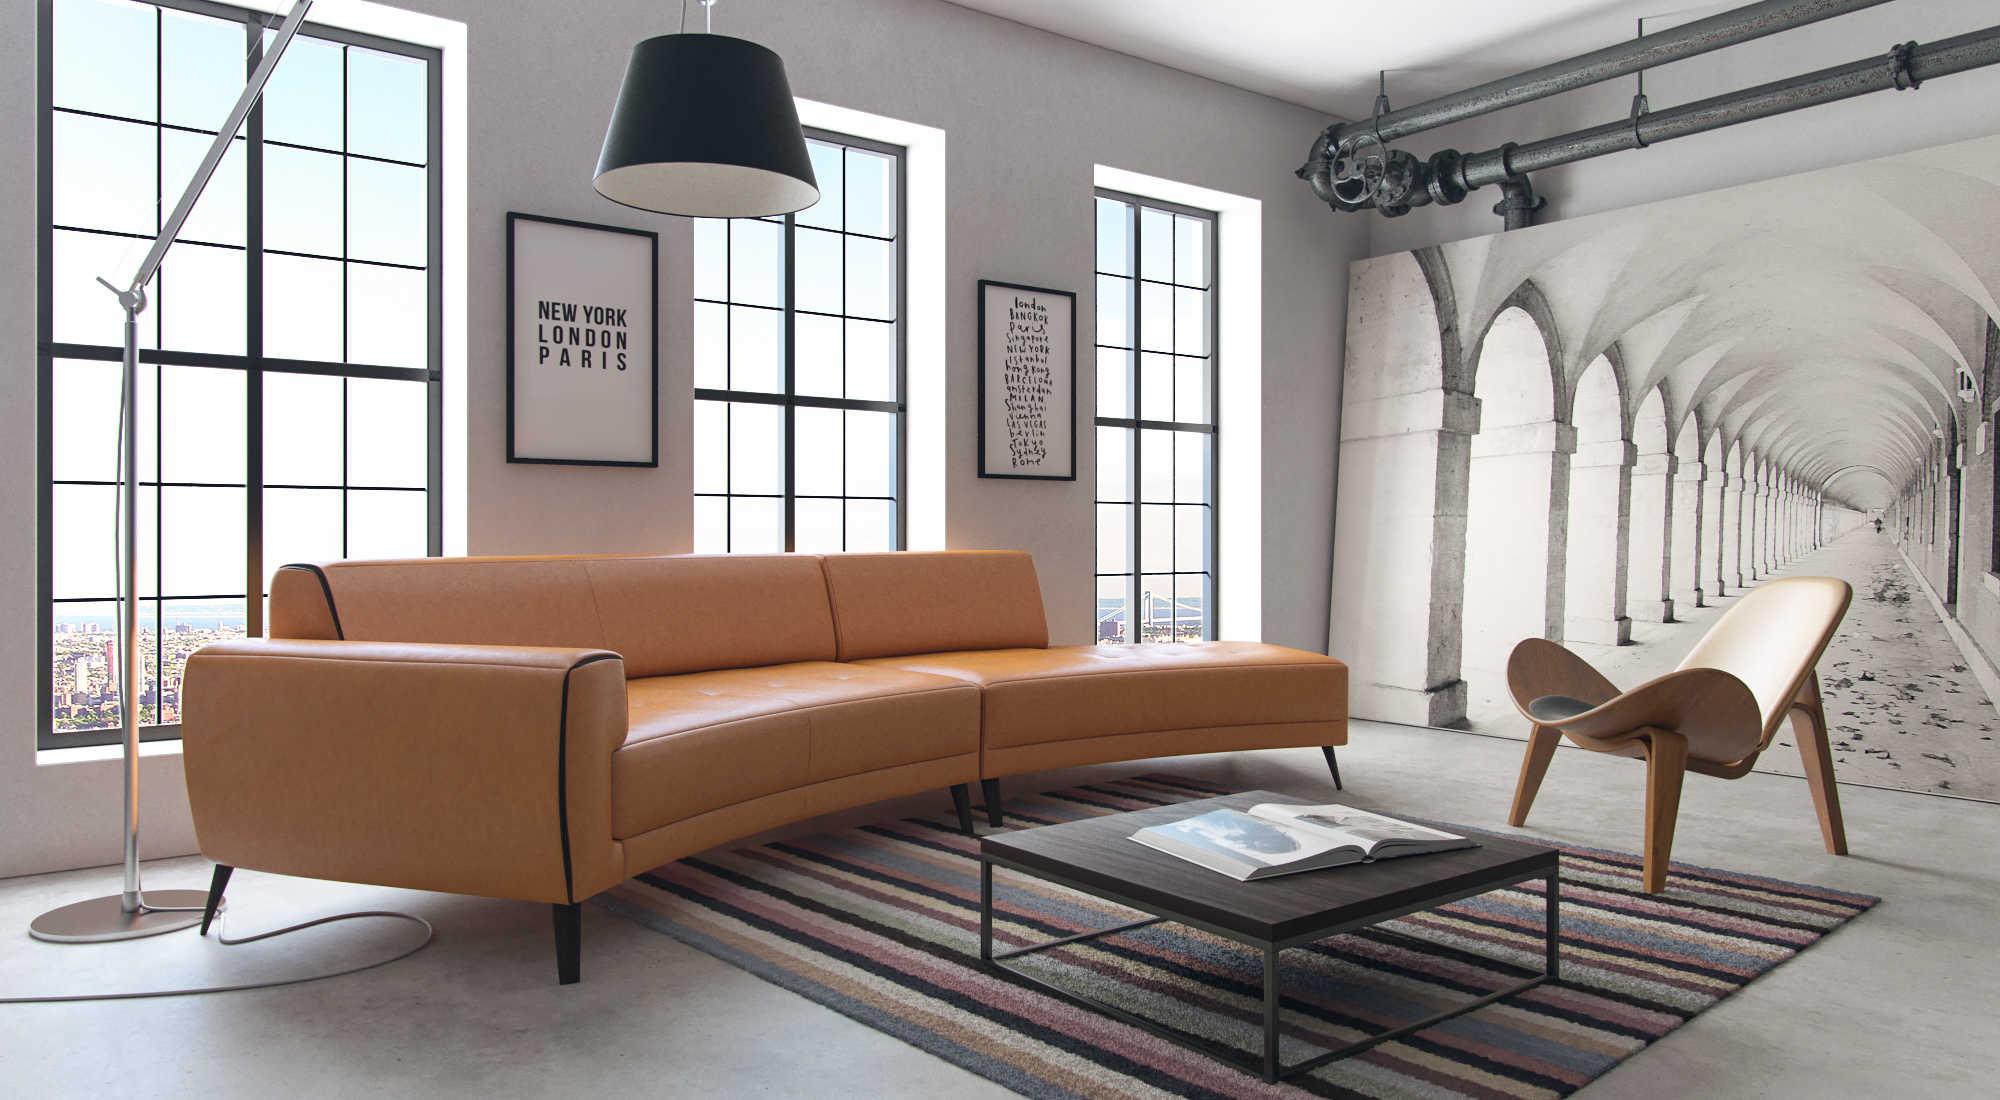 Moroni Casablanca Honey Two Piece Sectional Sofa